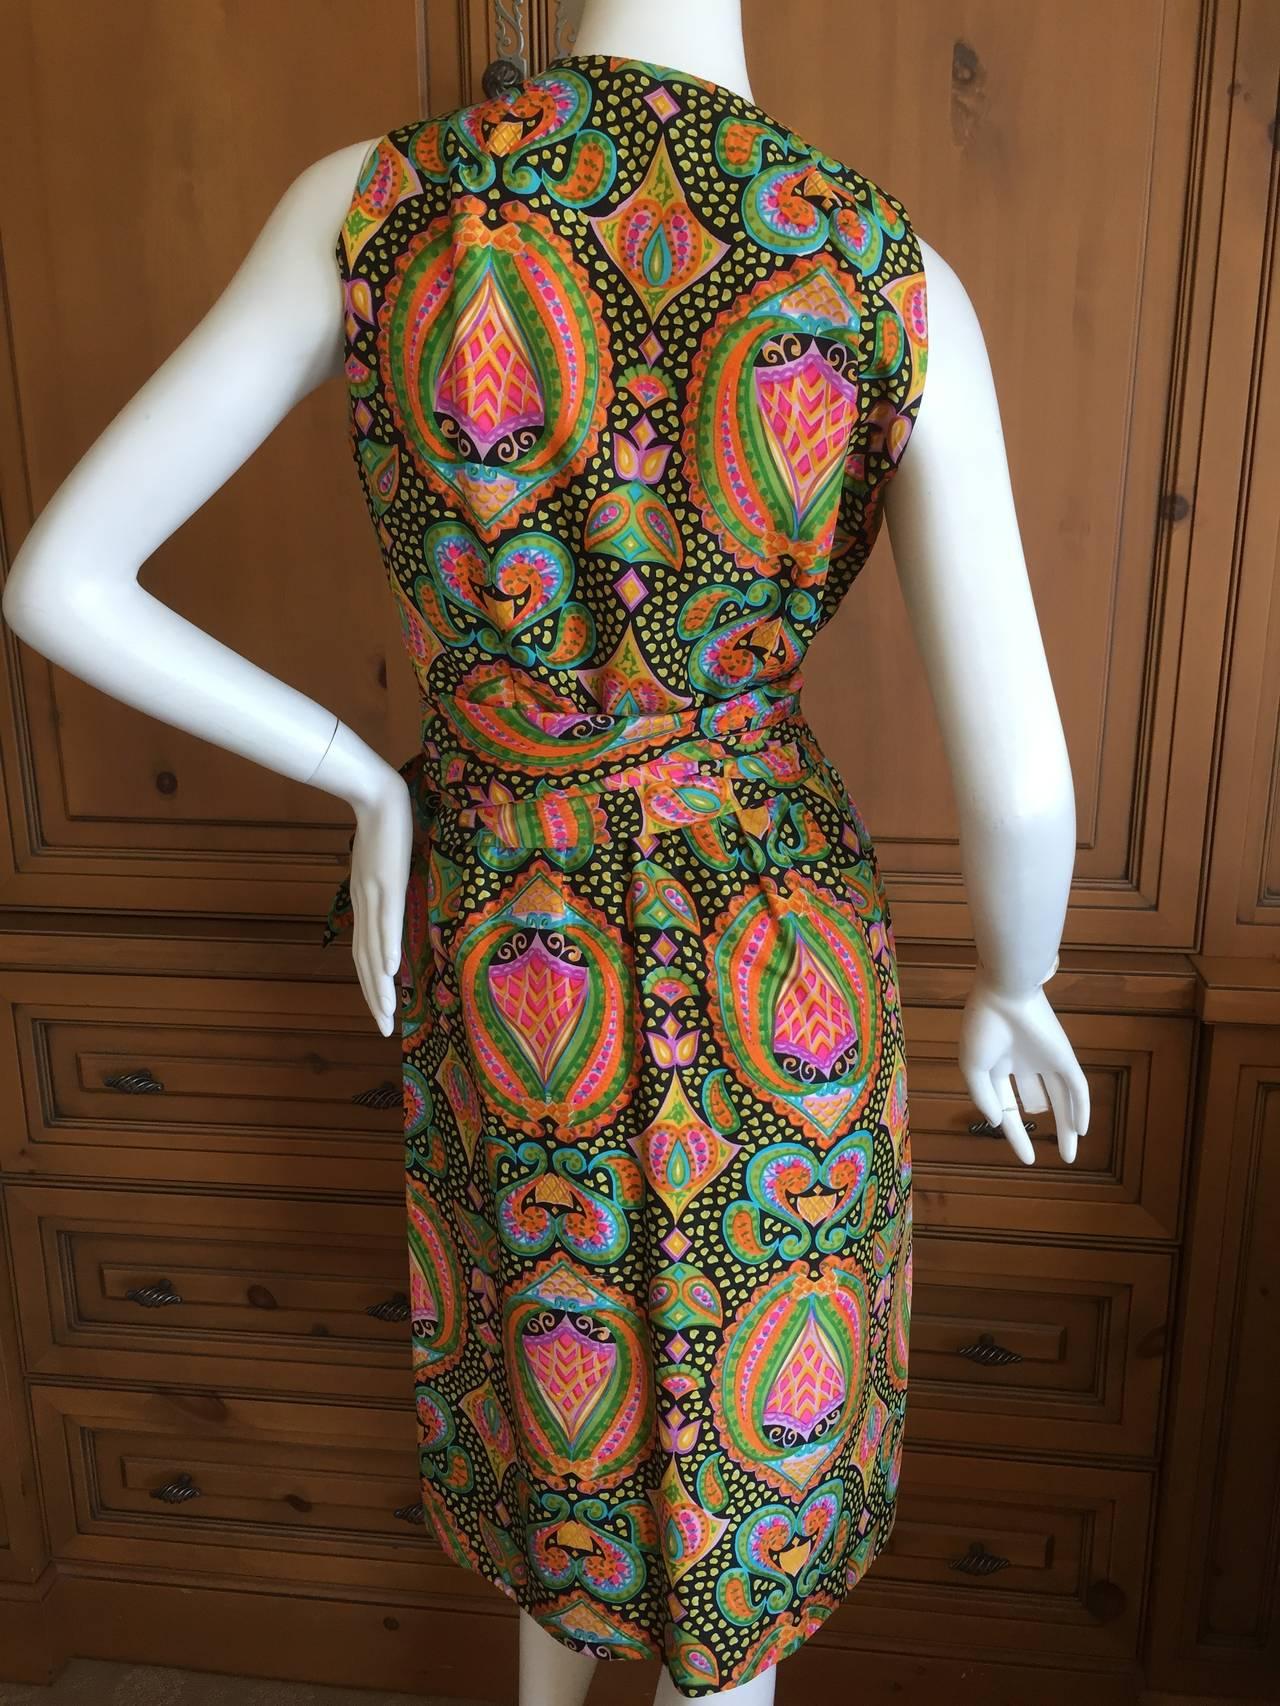 Geoffrey Beene 1970's Sleeveless Silk Dress with Sash 7